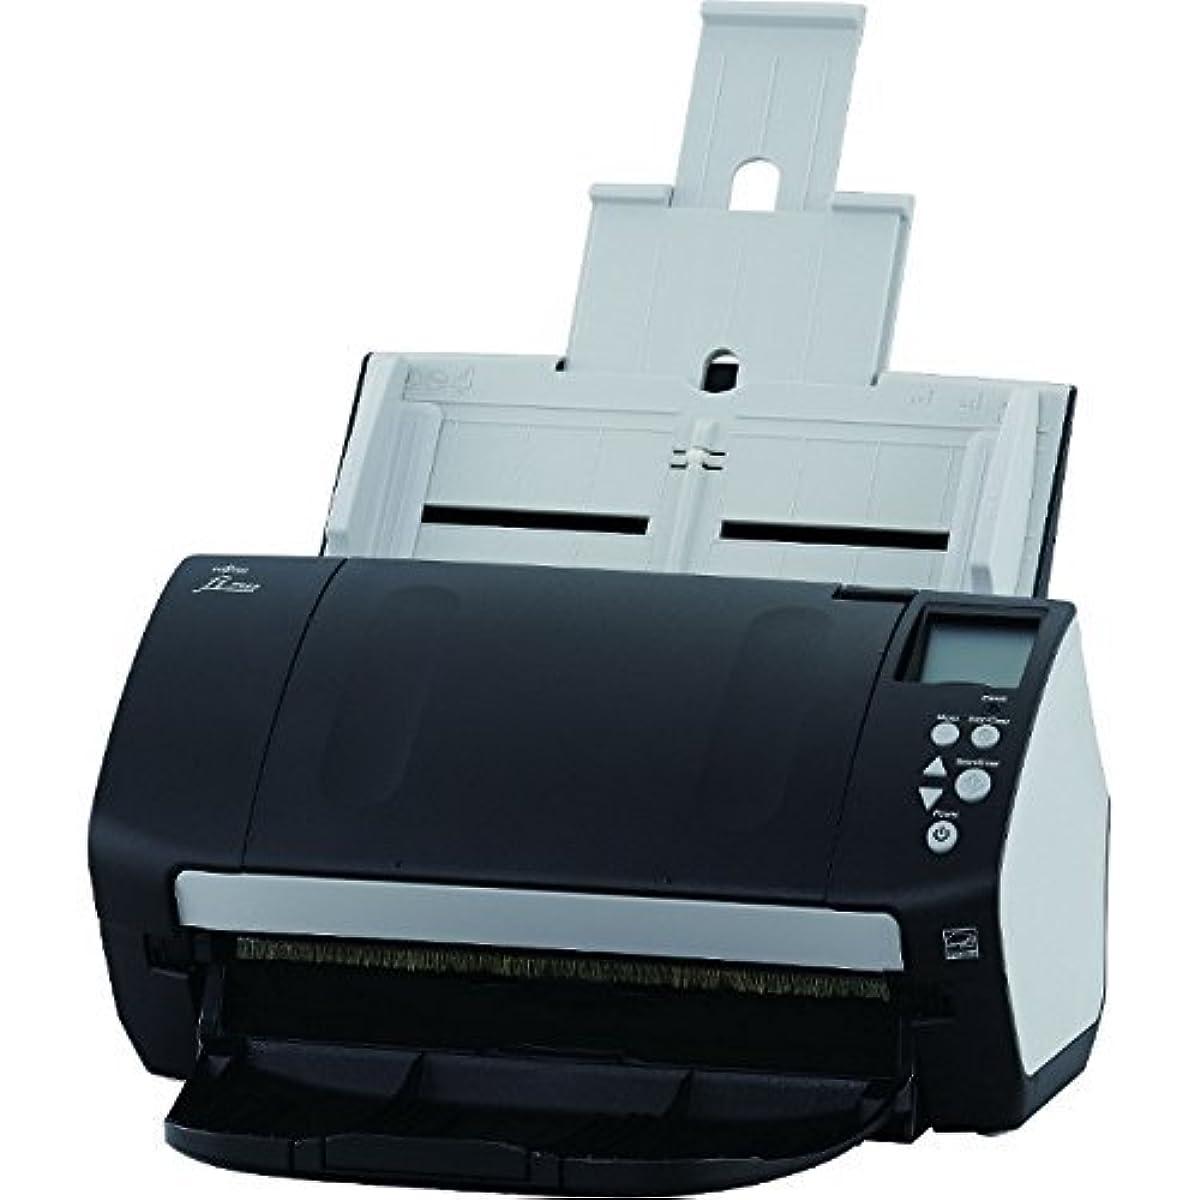 Fujitsu fi-7180 Color Duplex Document Scanner - Departmental Series